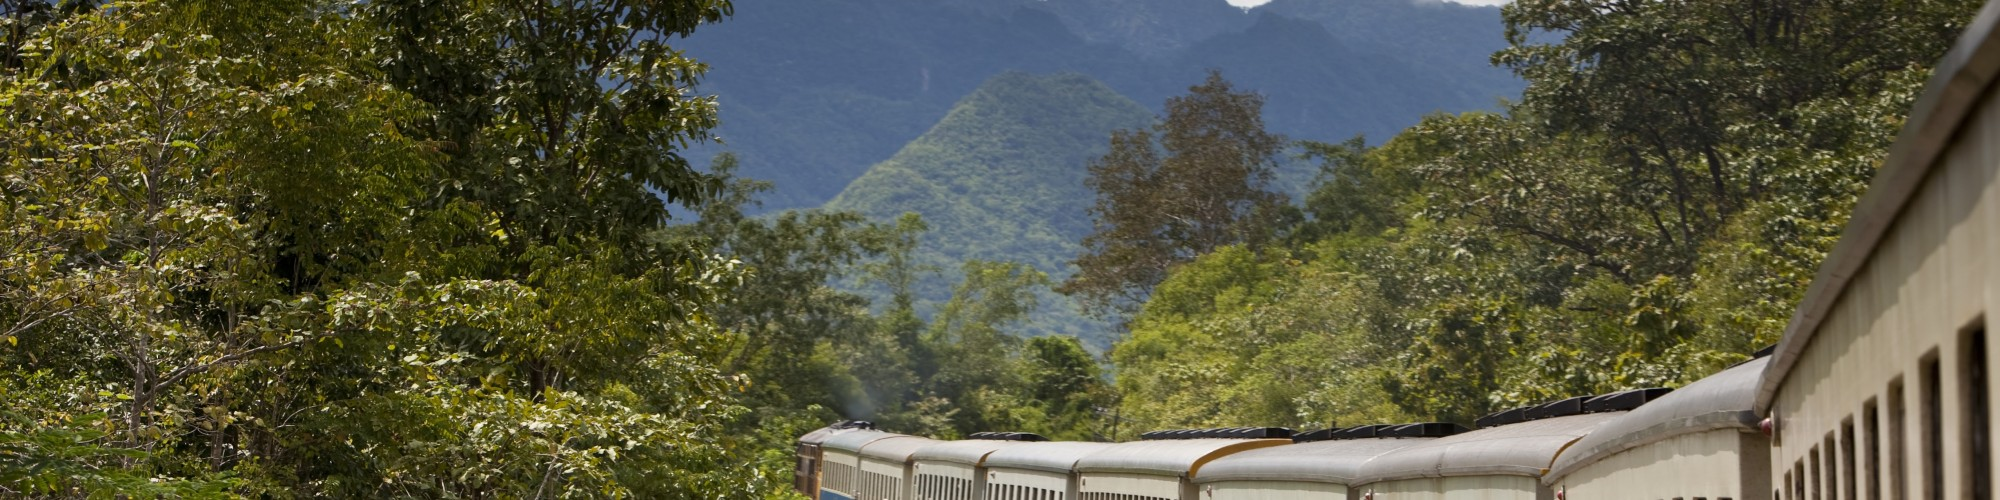 Thailand Burma Railway, Kanchanaburi, Thailand